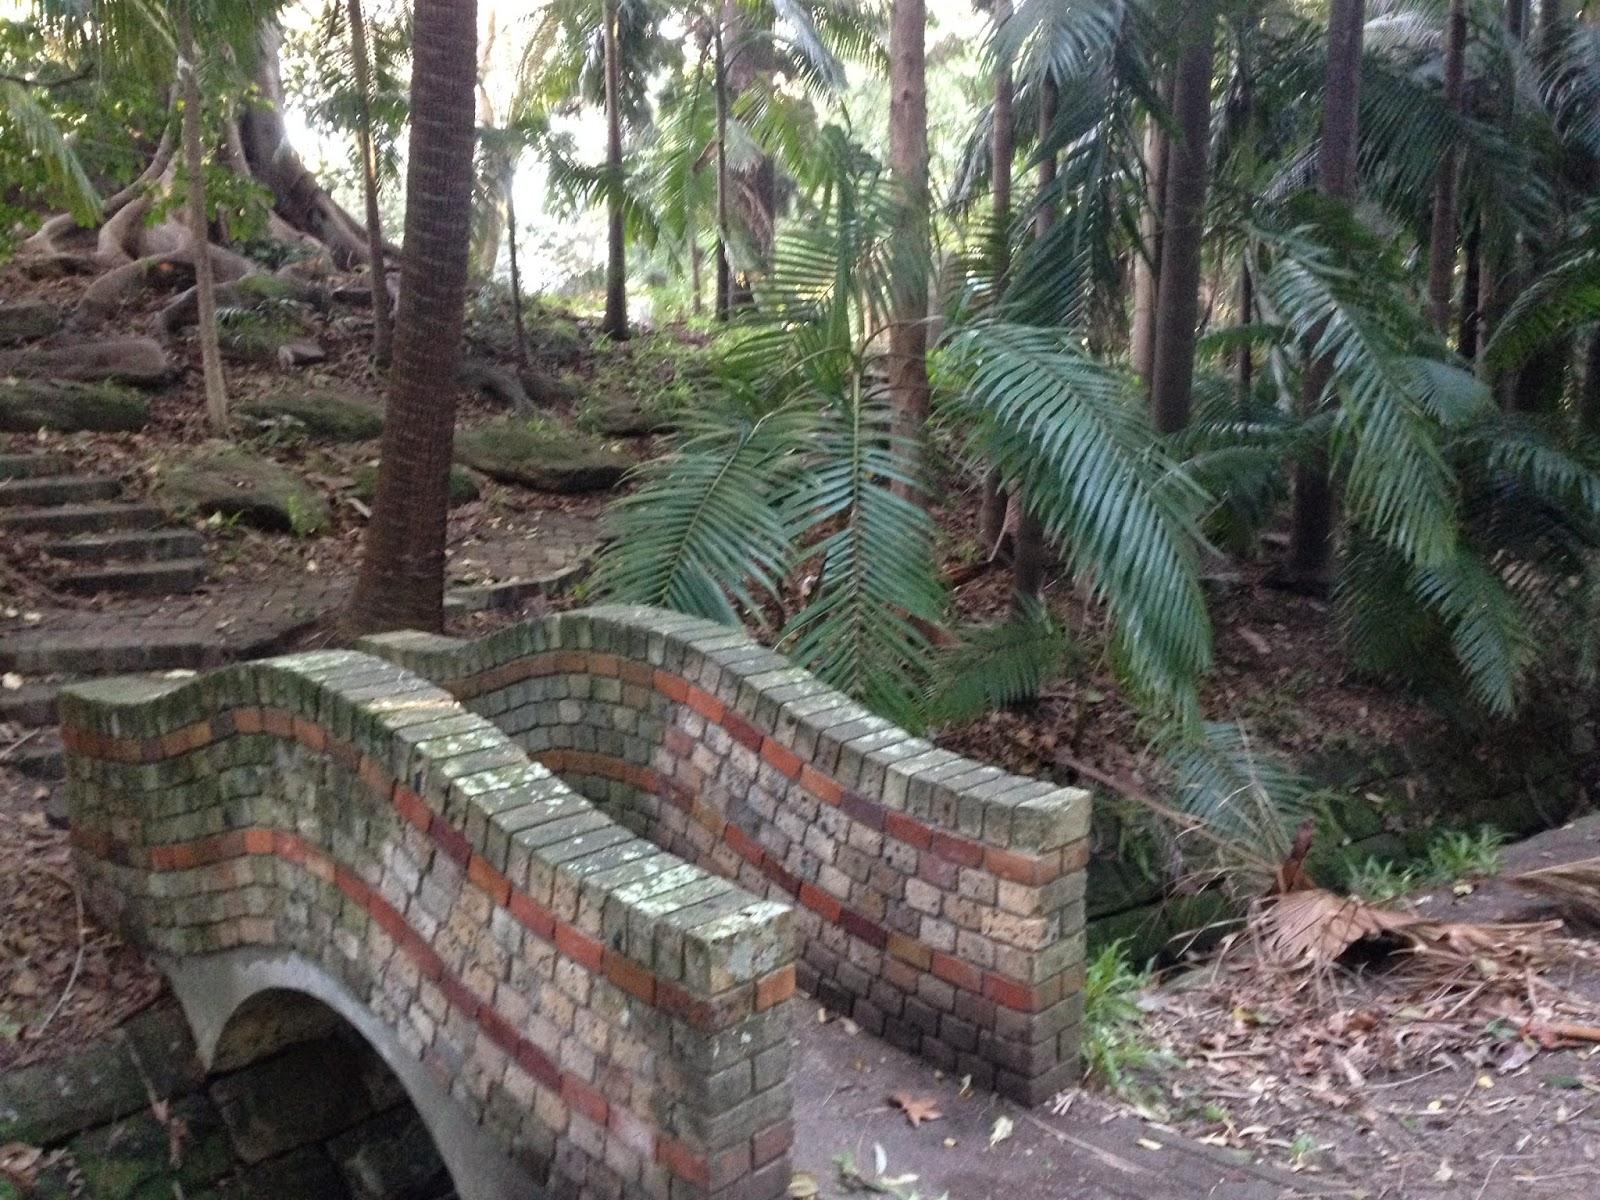 www.crookedcottage.com.au